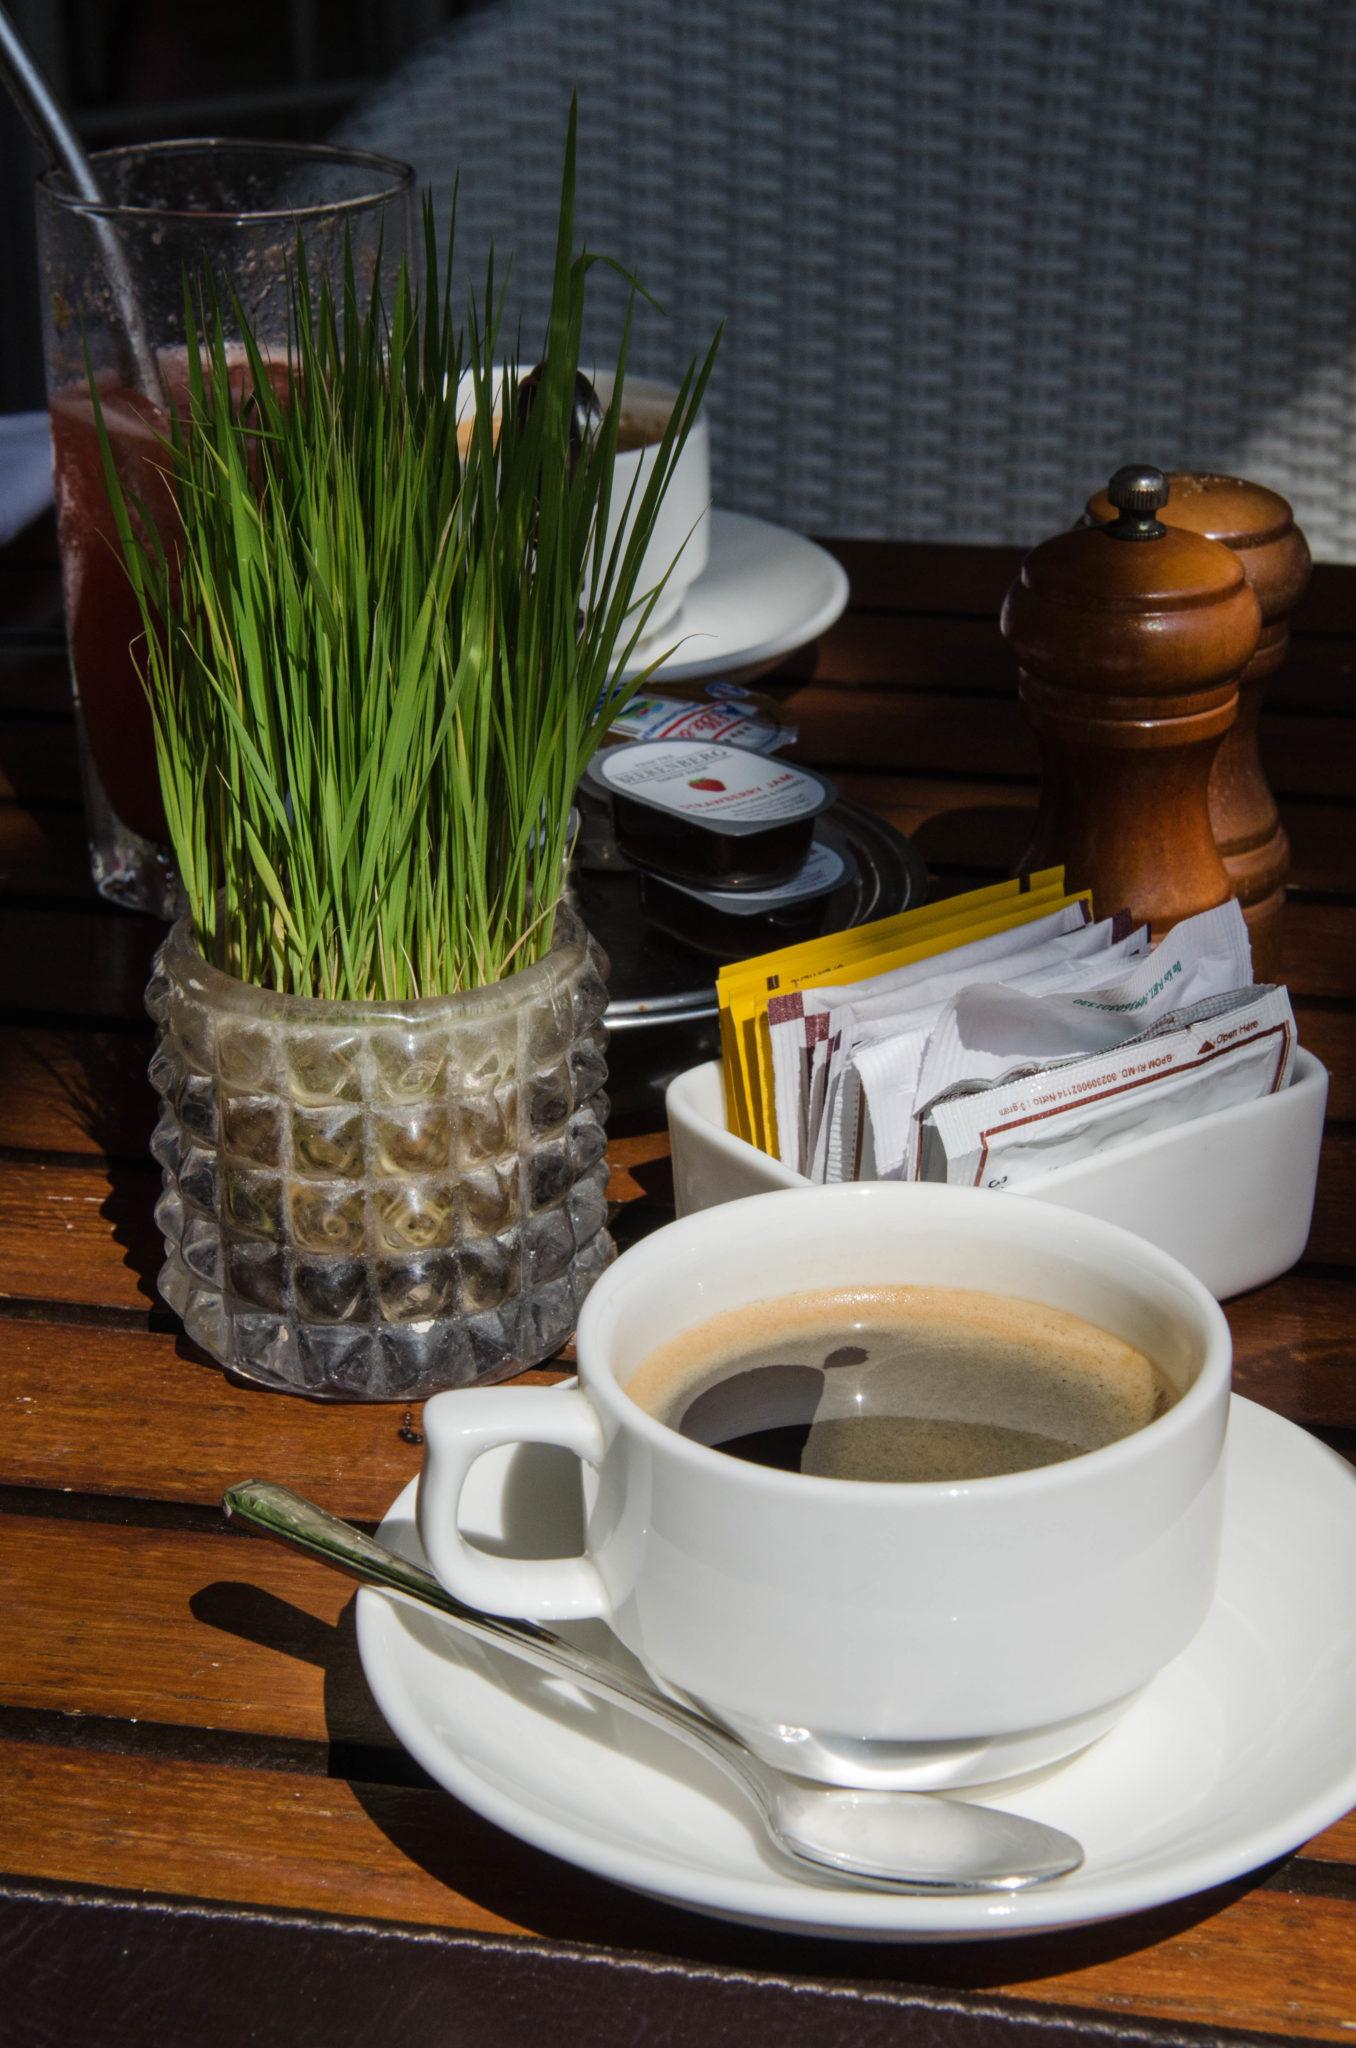 Der Kaffee beim Frühstück